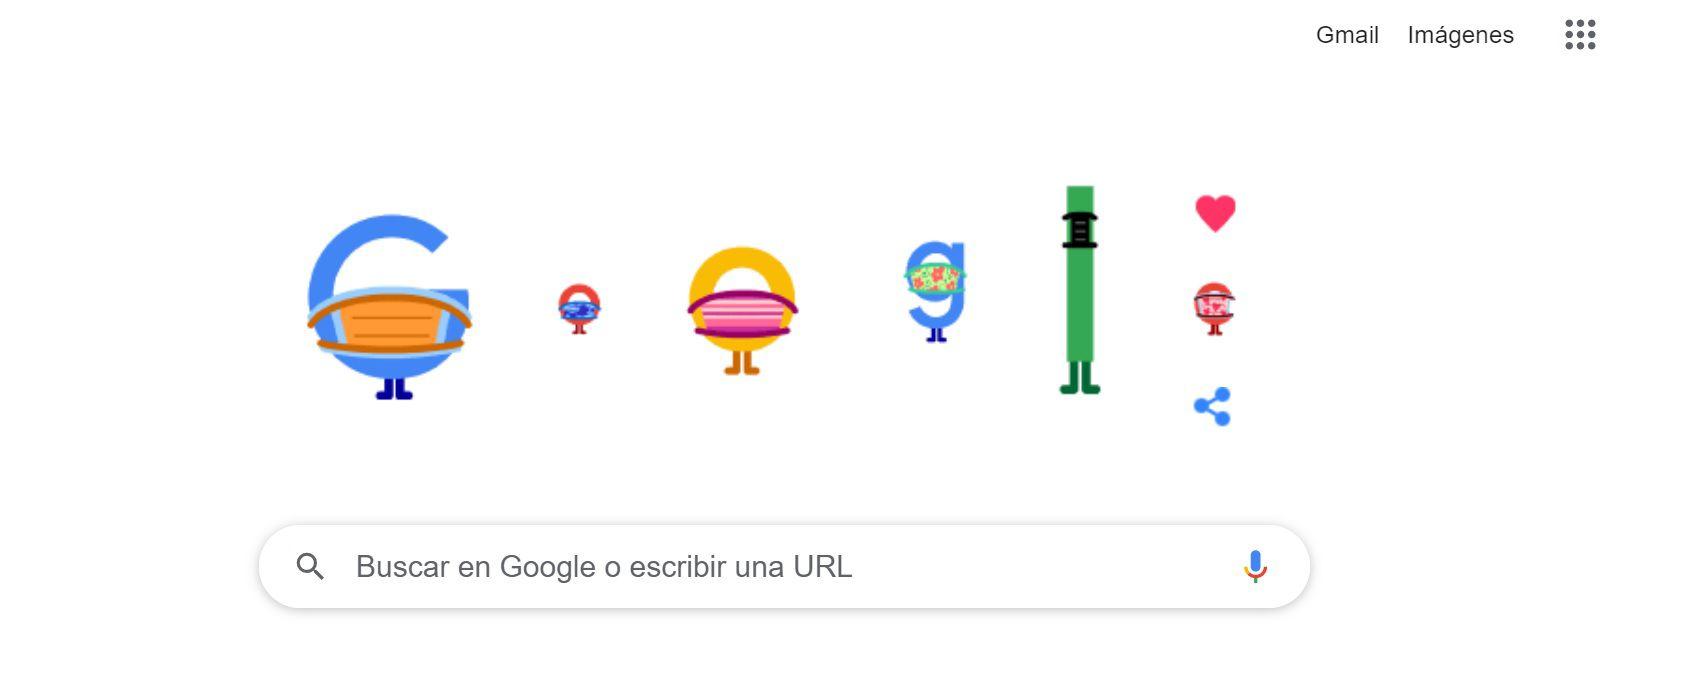 Google doodle mascarillas